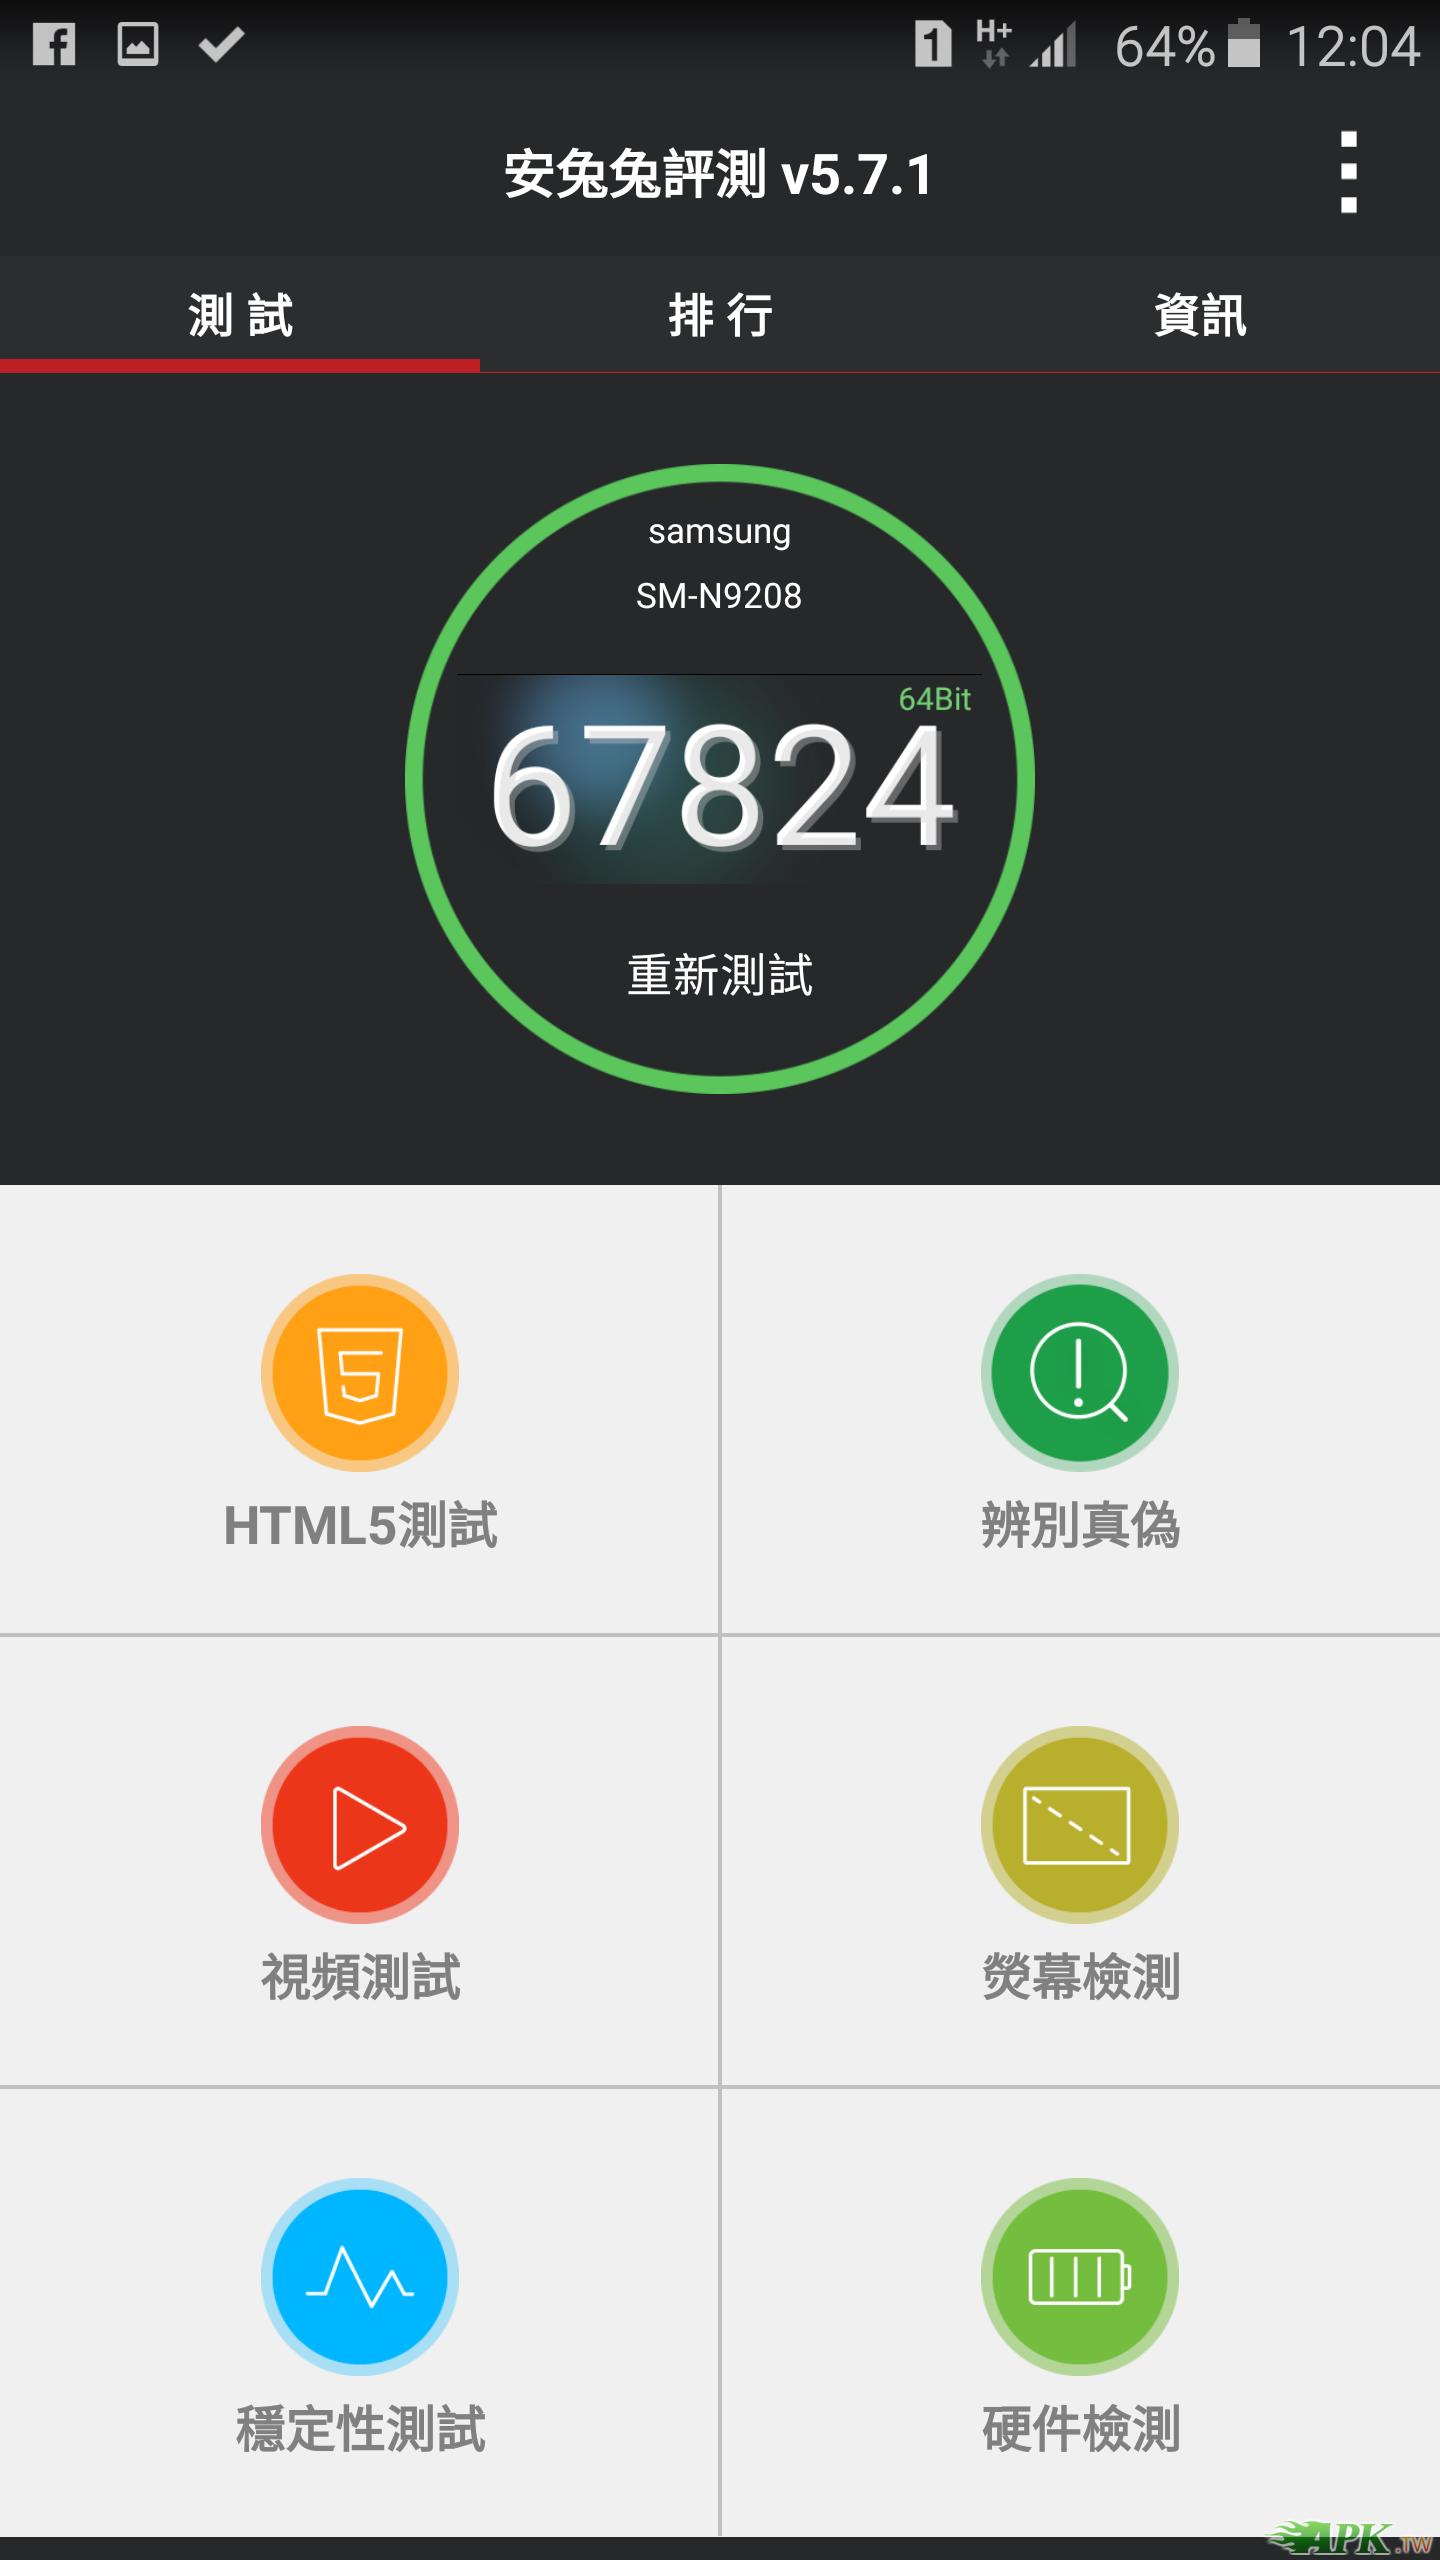 Screenshot_2015-10-09-12-04-02.png